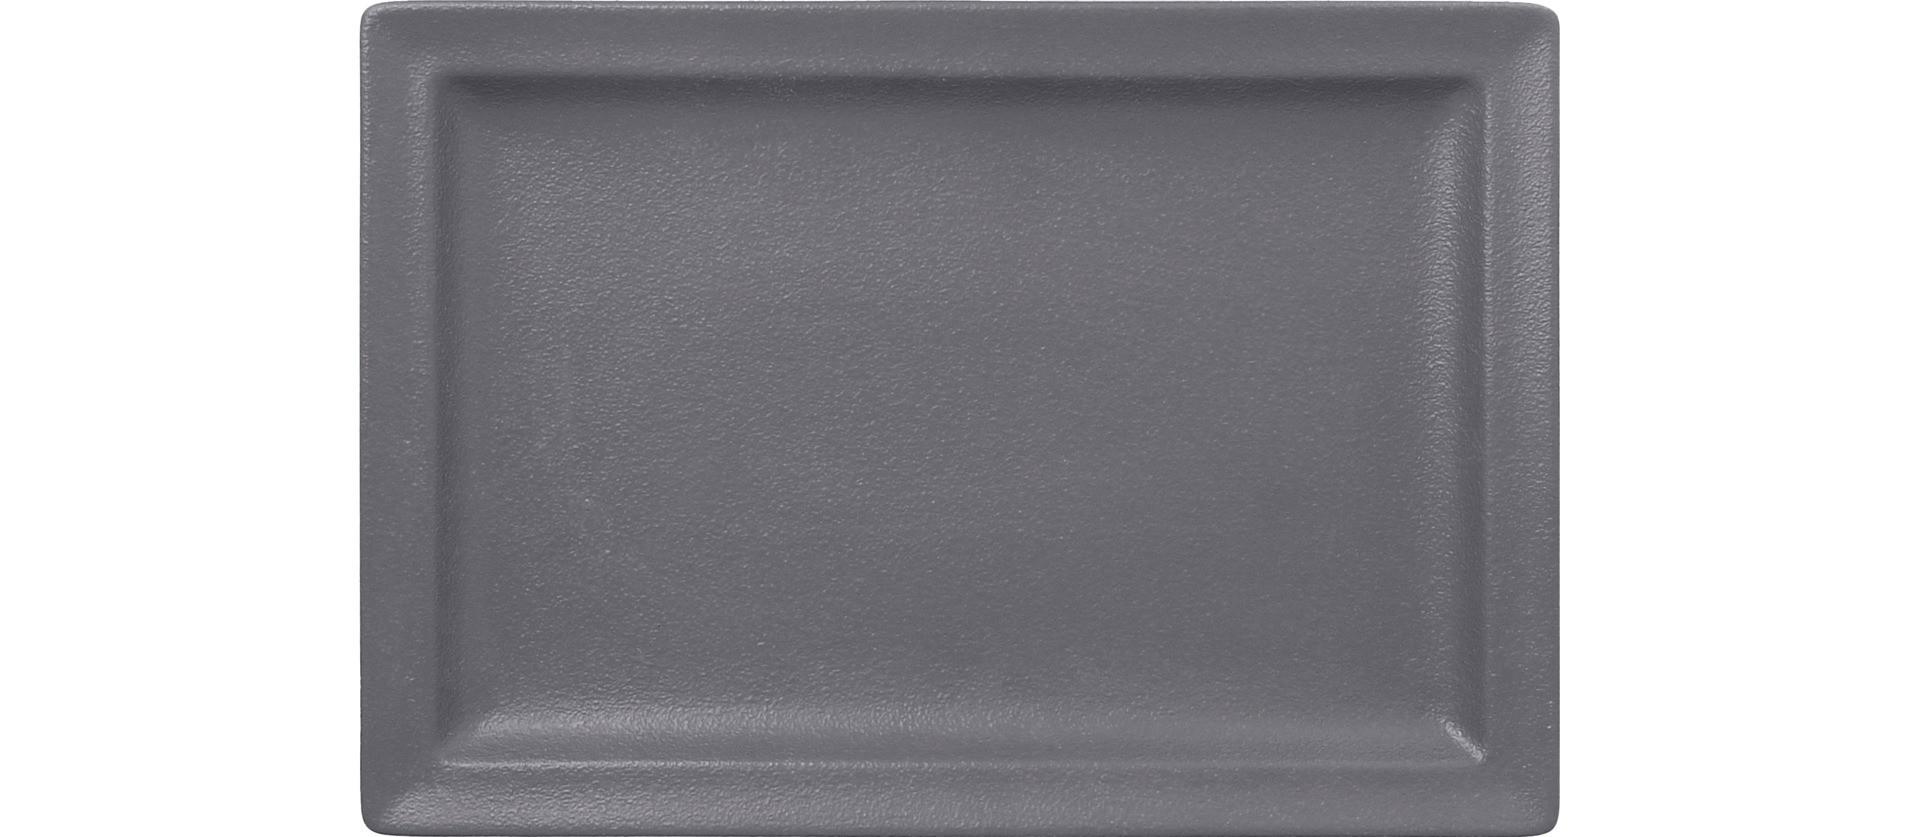 Neofusion, Teller flach rechteckig 330 x 230 mm stone